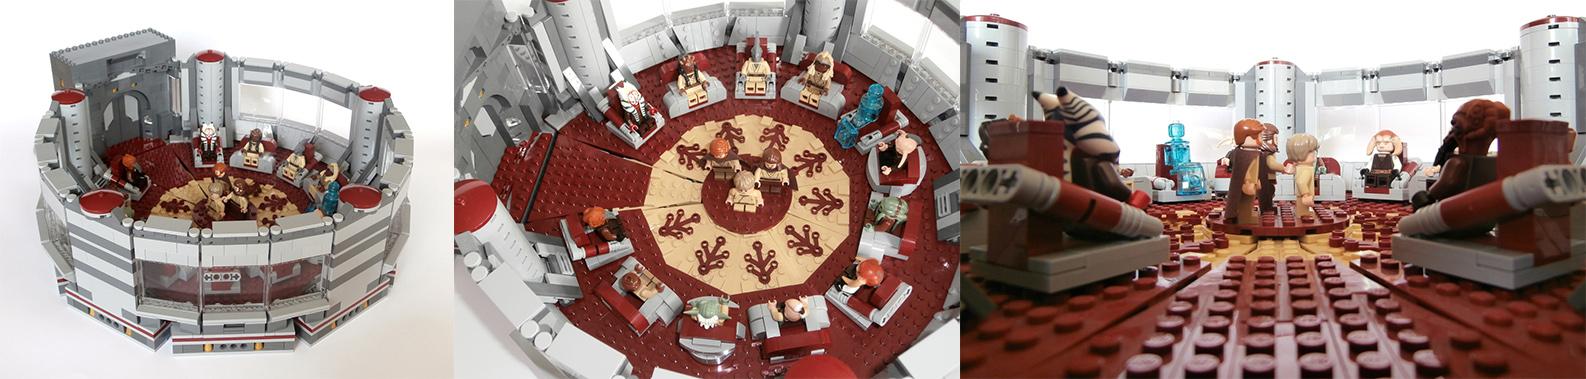 rejected lego ideas jedi council